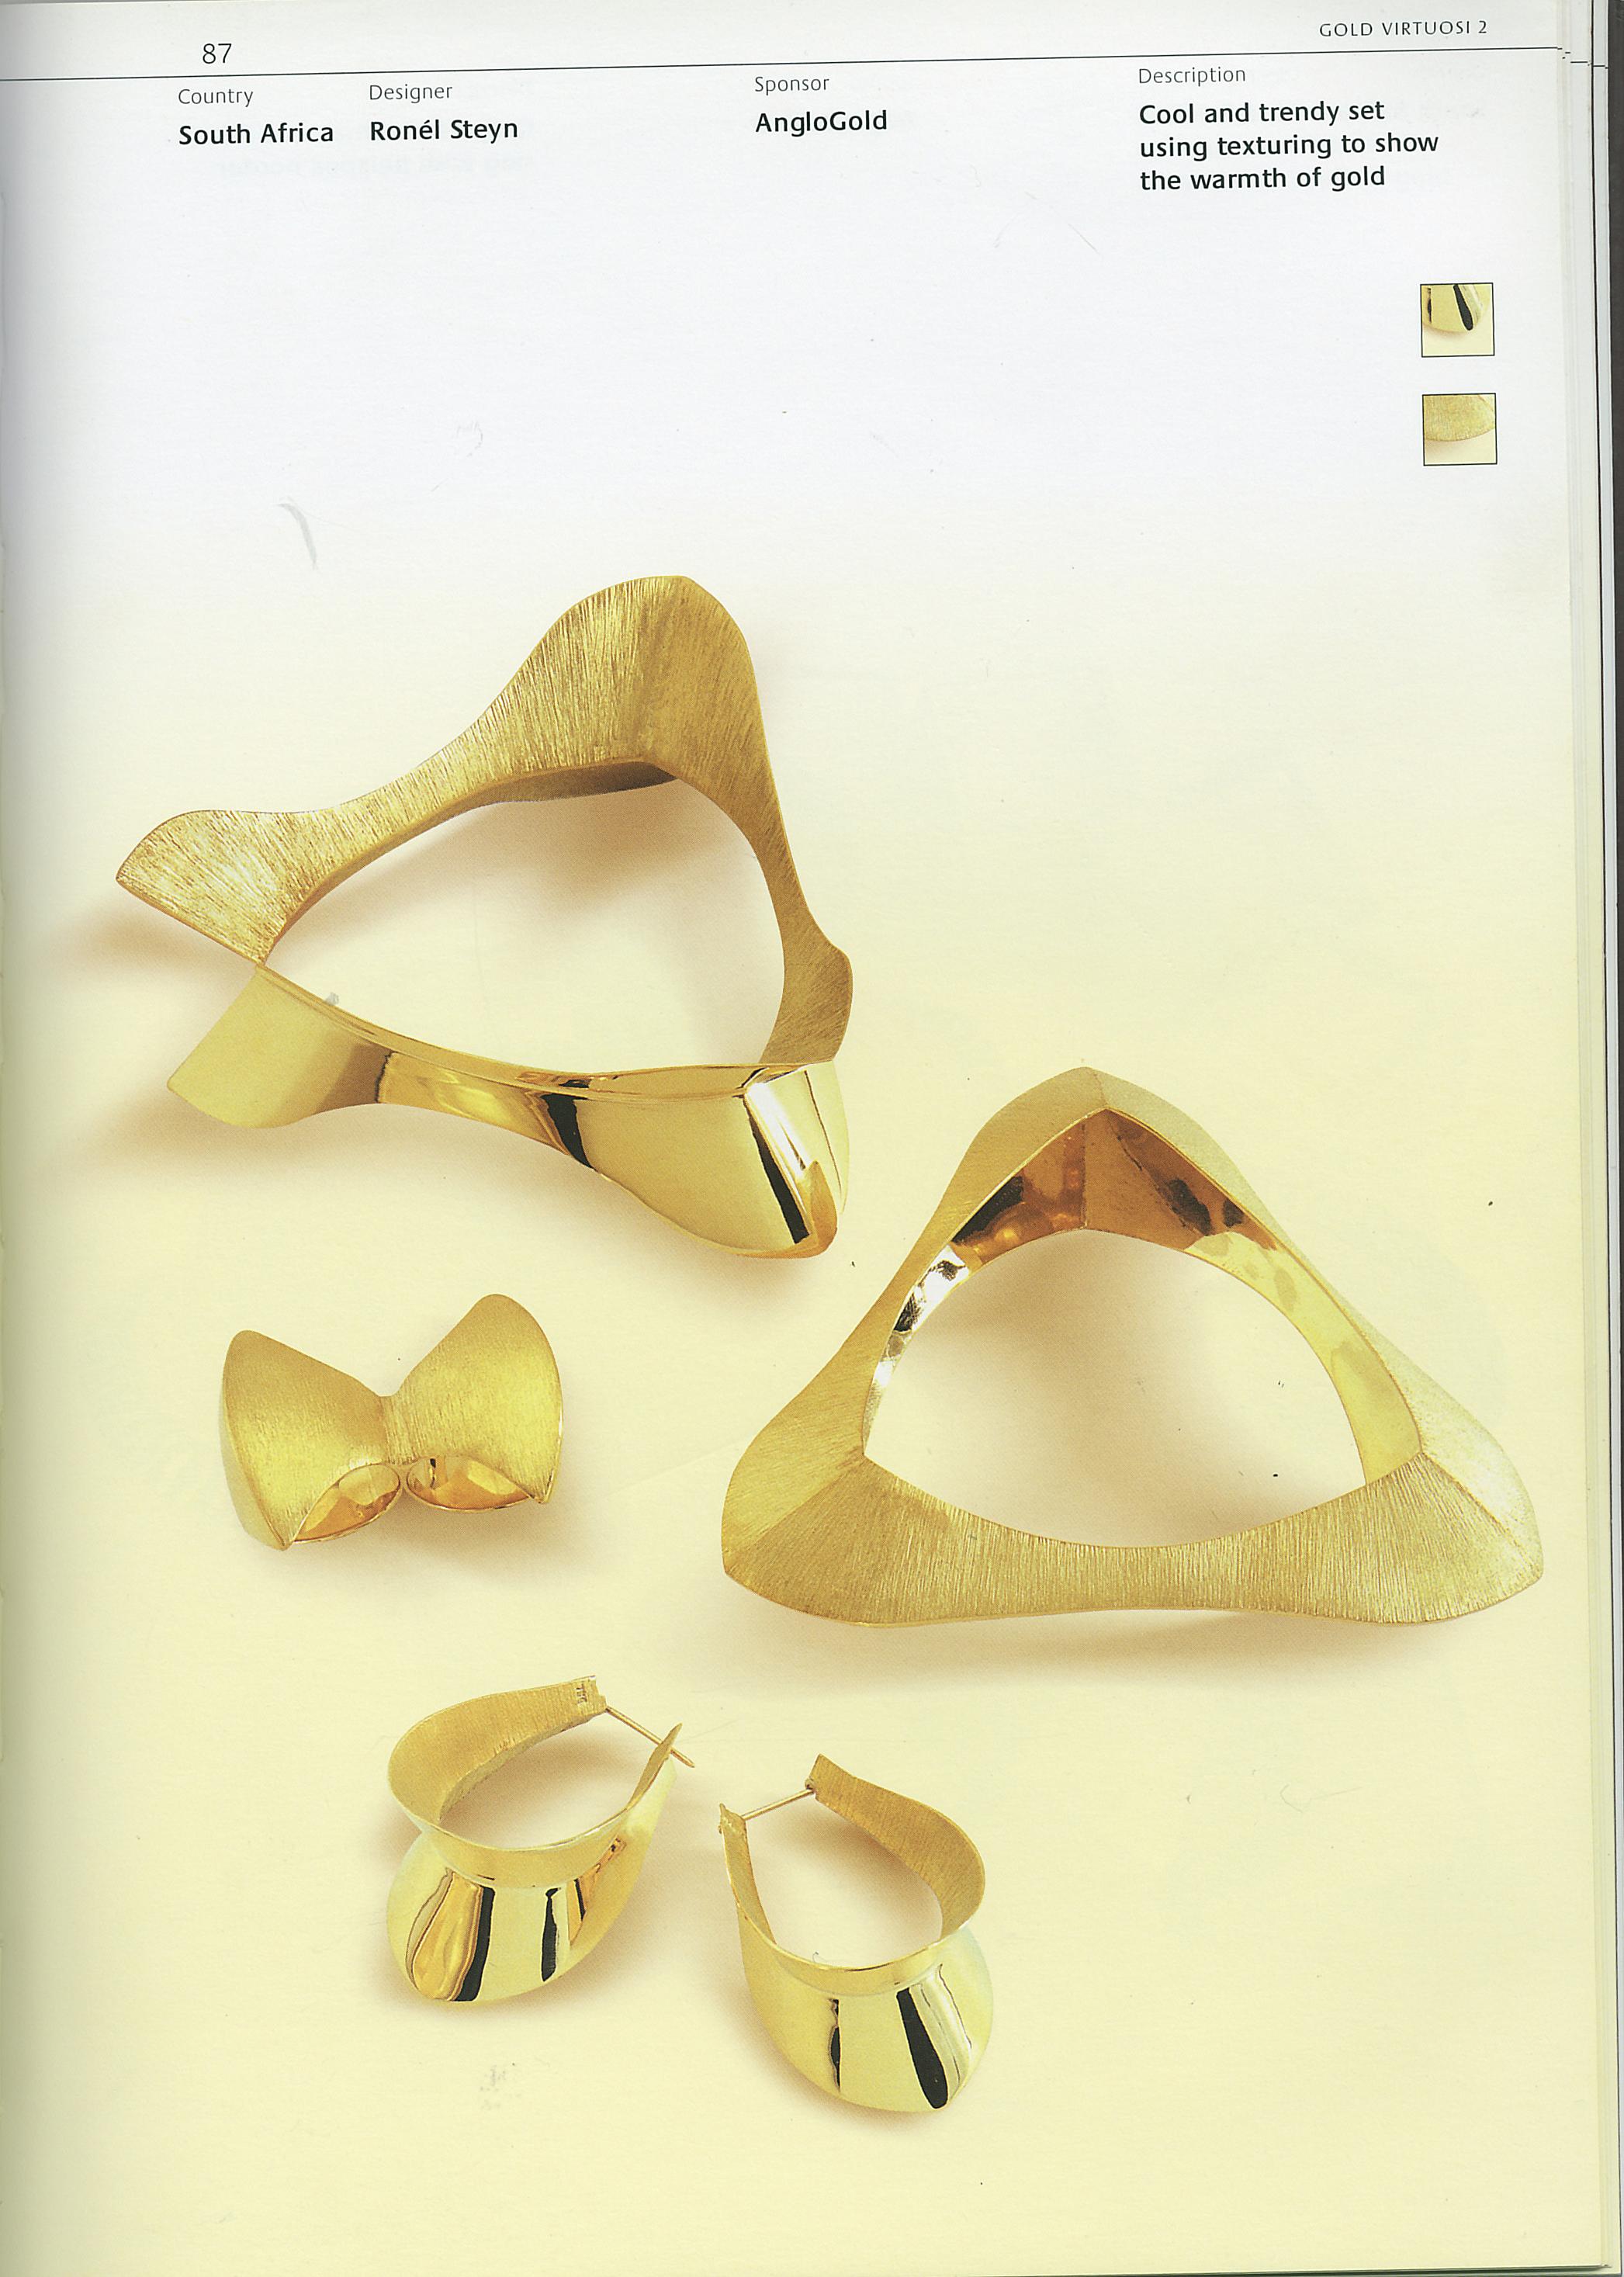 GOLD VIRTUOSI MAGAZINE 2002